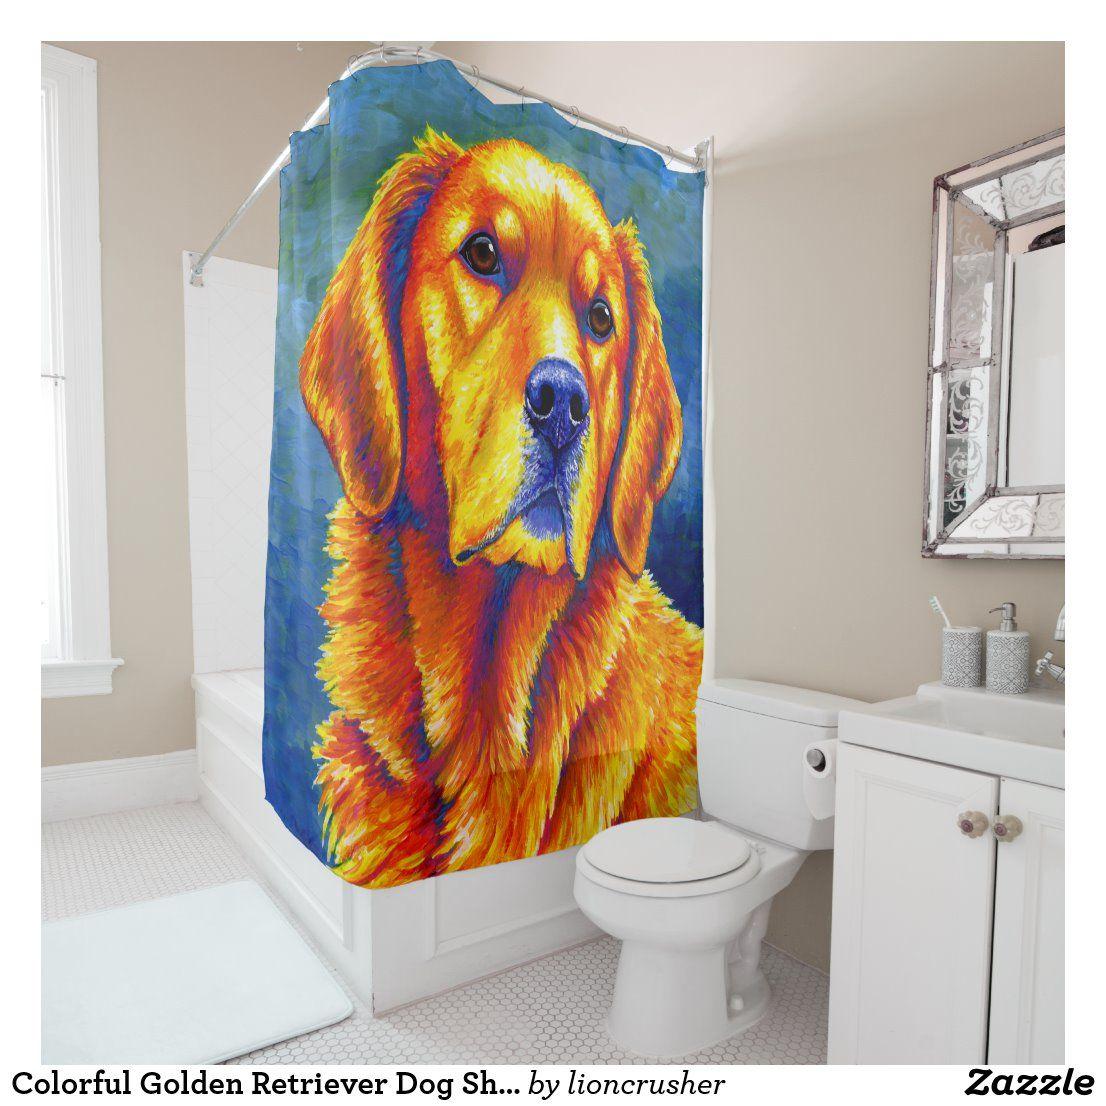 Colorful Golden Retriever Dog Shower Curtain Zazzle Com In 2020